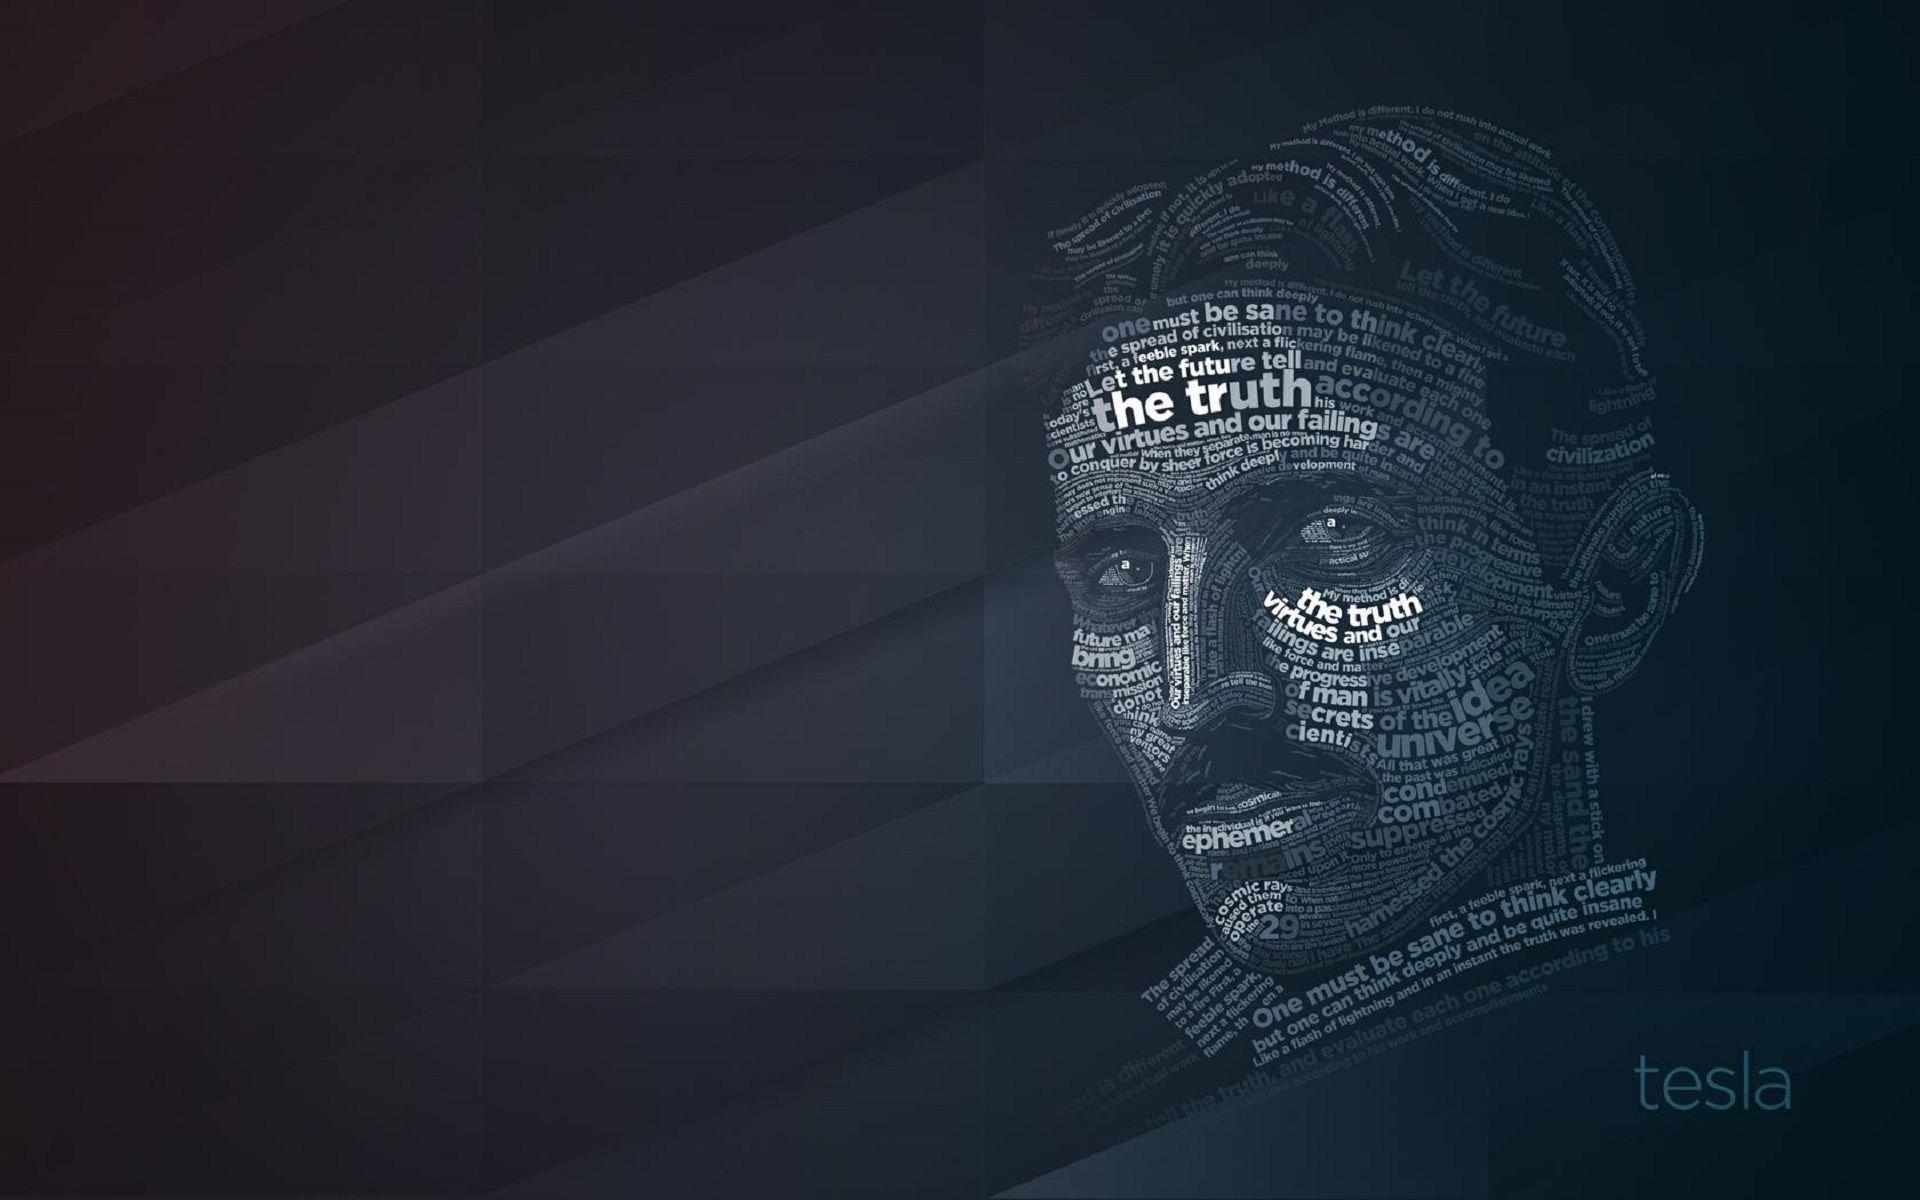 Nikola Tesla Wallpapers Top Free Nikola Tesla Backgrounds Wallpaperaccess